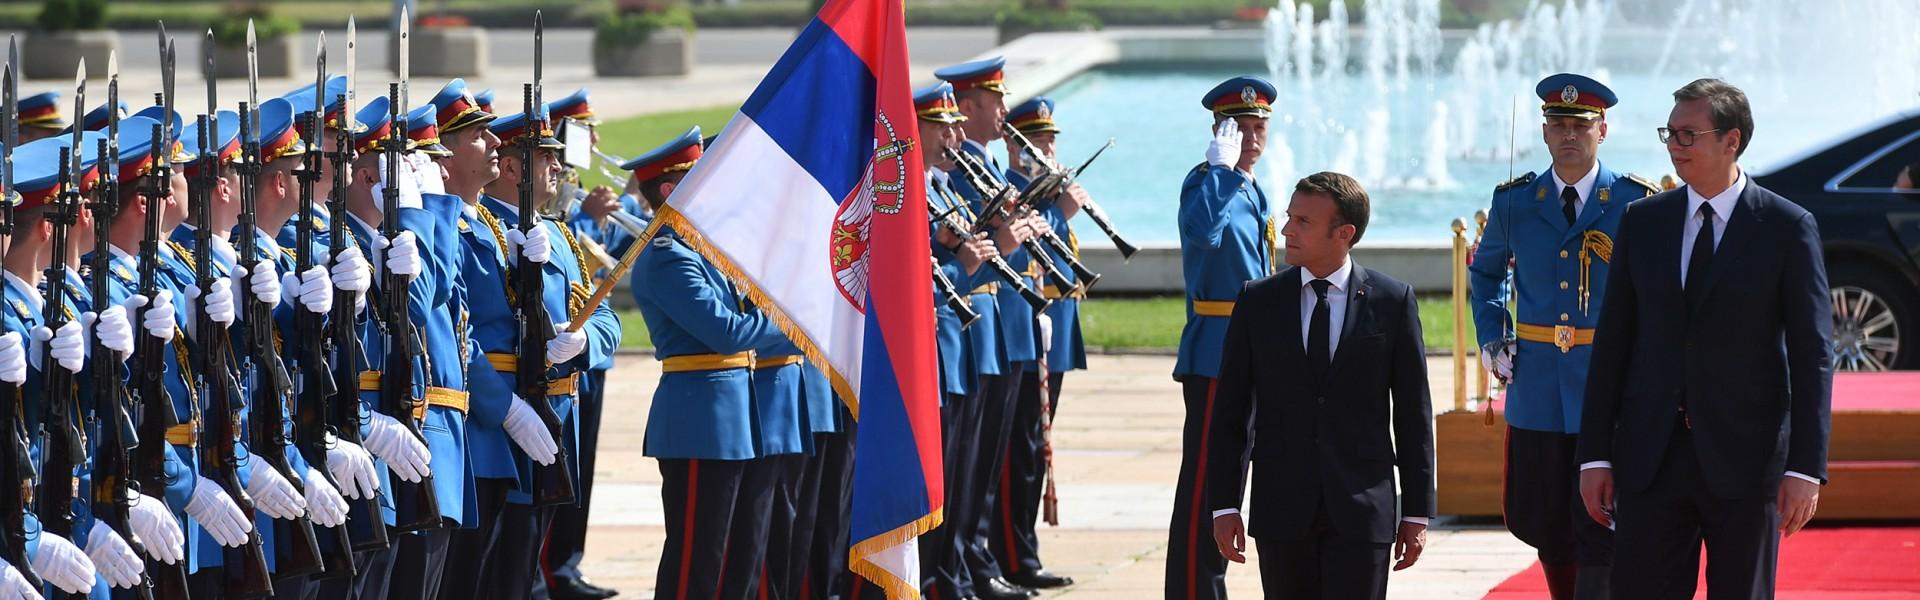 Poseta predsednika Francuske Republike Makrona Republici Srbiji